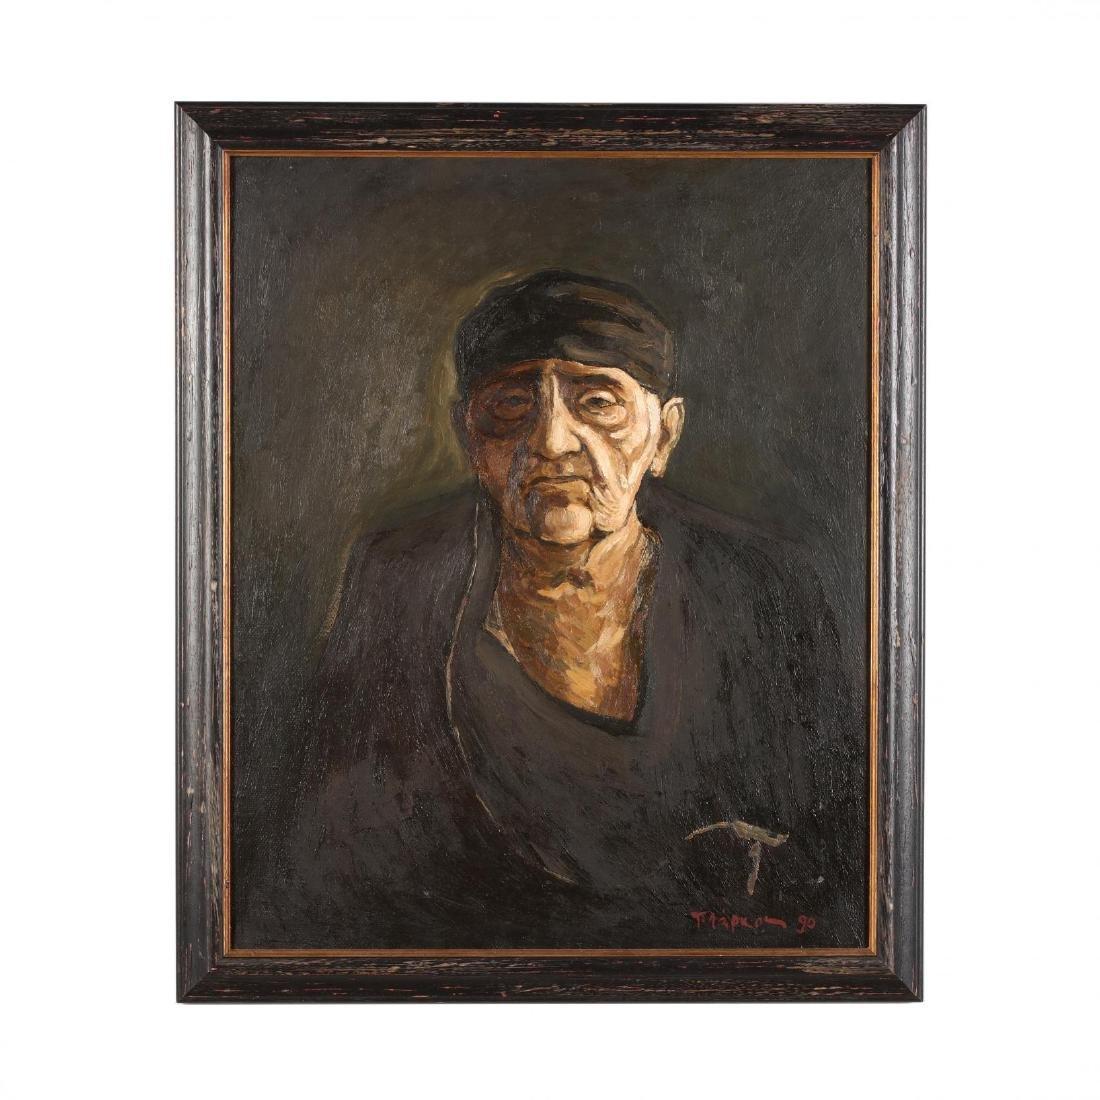 Portrait of an Elderly Greek or Cypriot Woman